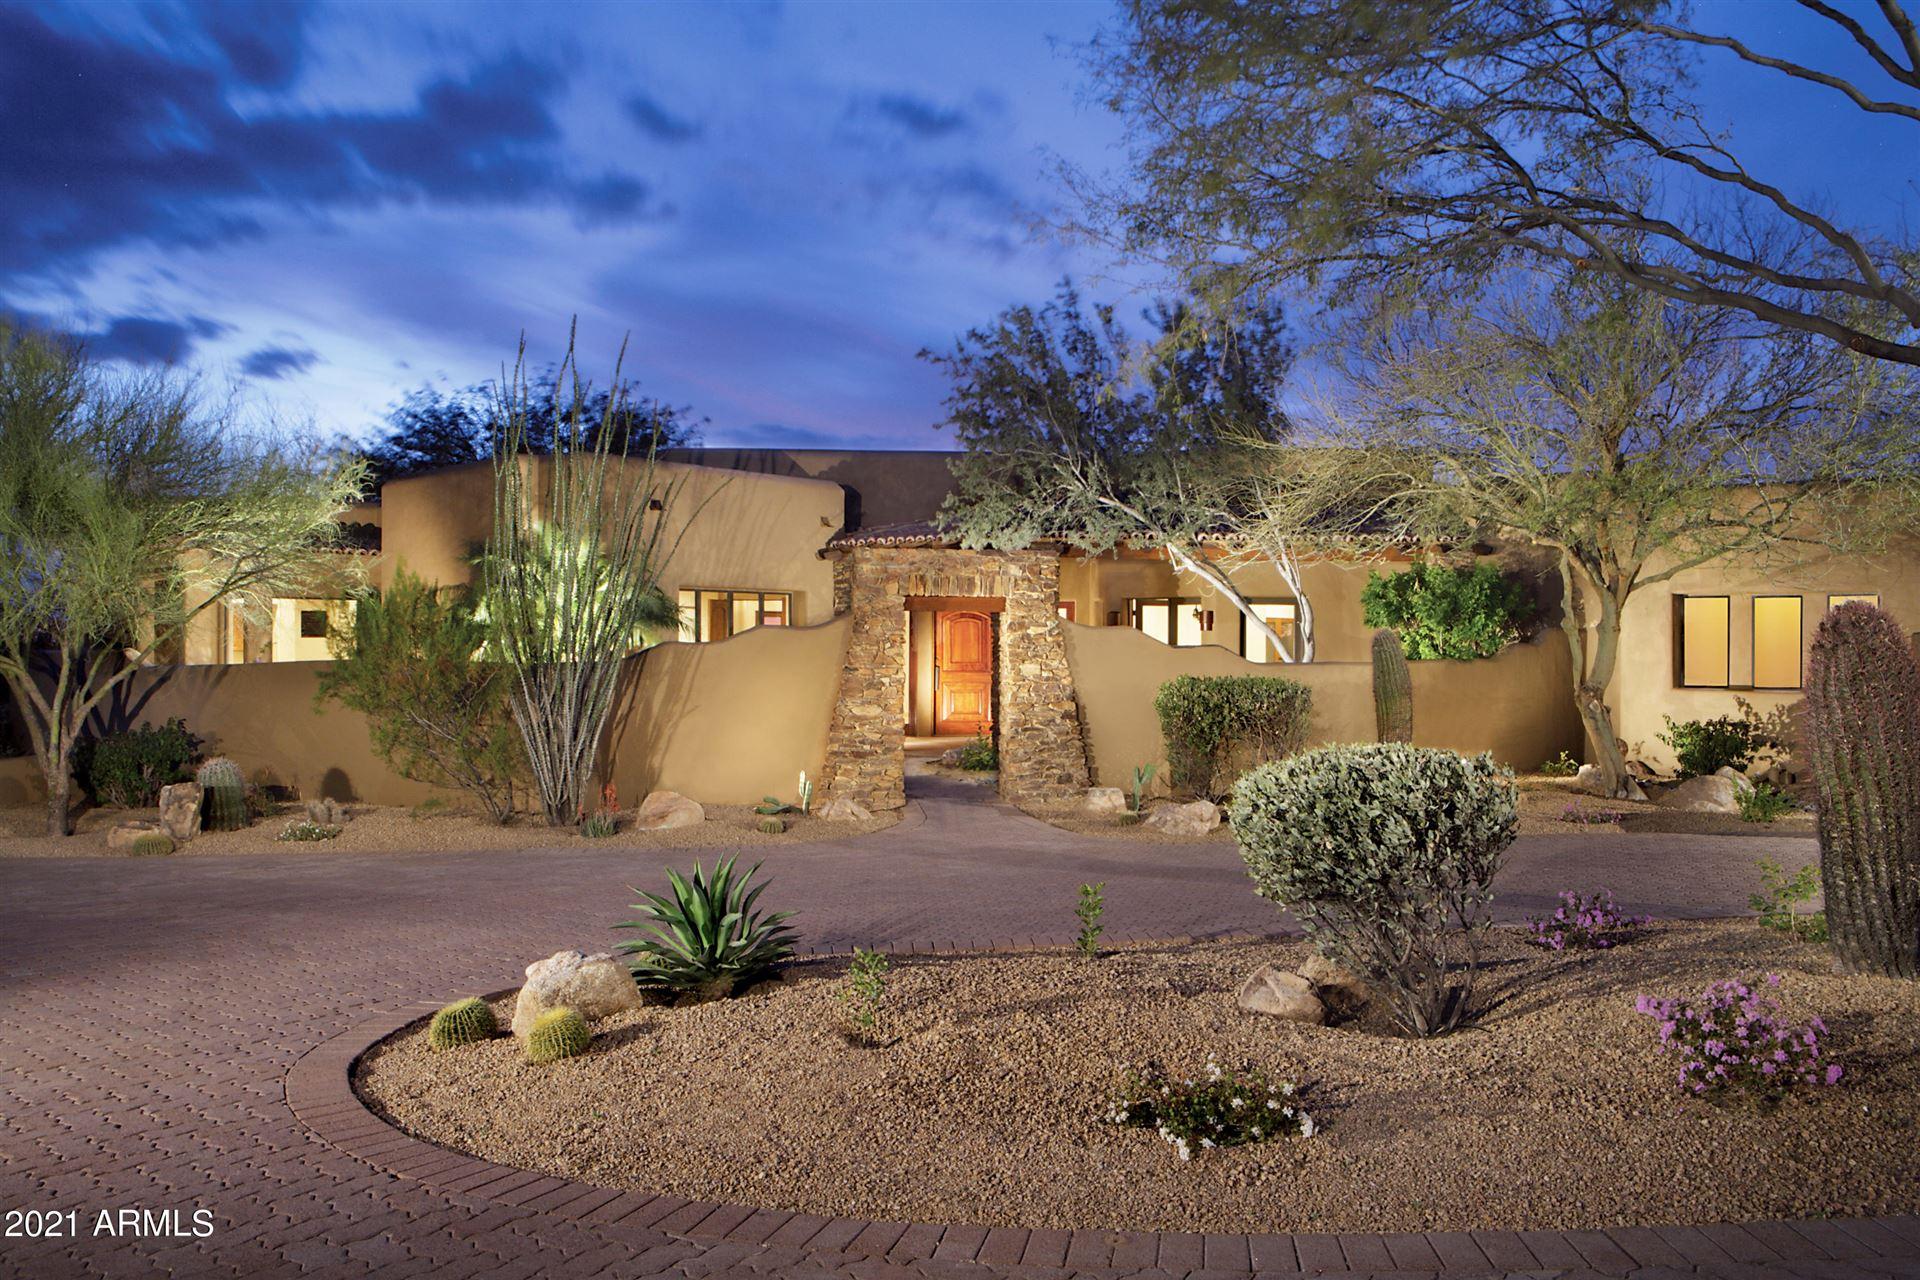 Photo of 10040 E HAPPY VALLEY Road #395, Scottsdale, AZ 85255 (MLS # 6235063)